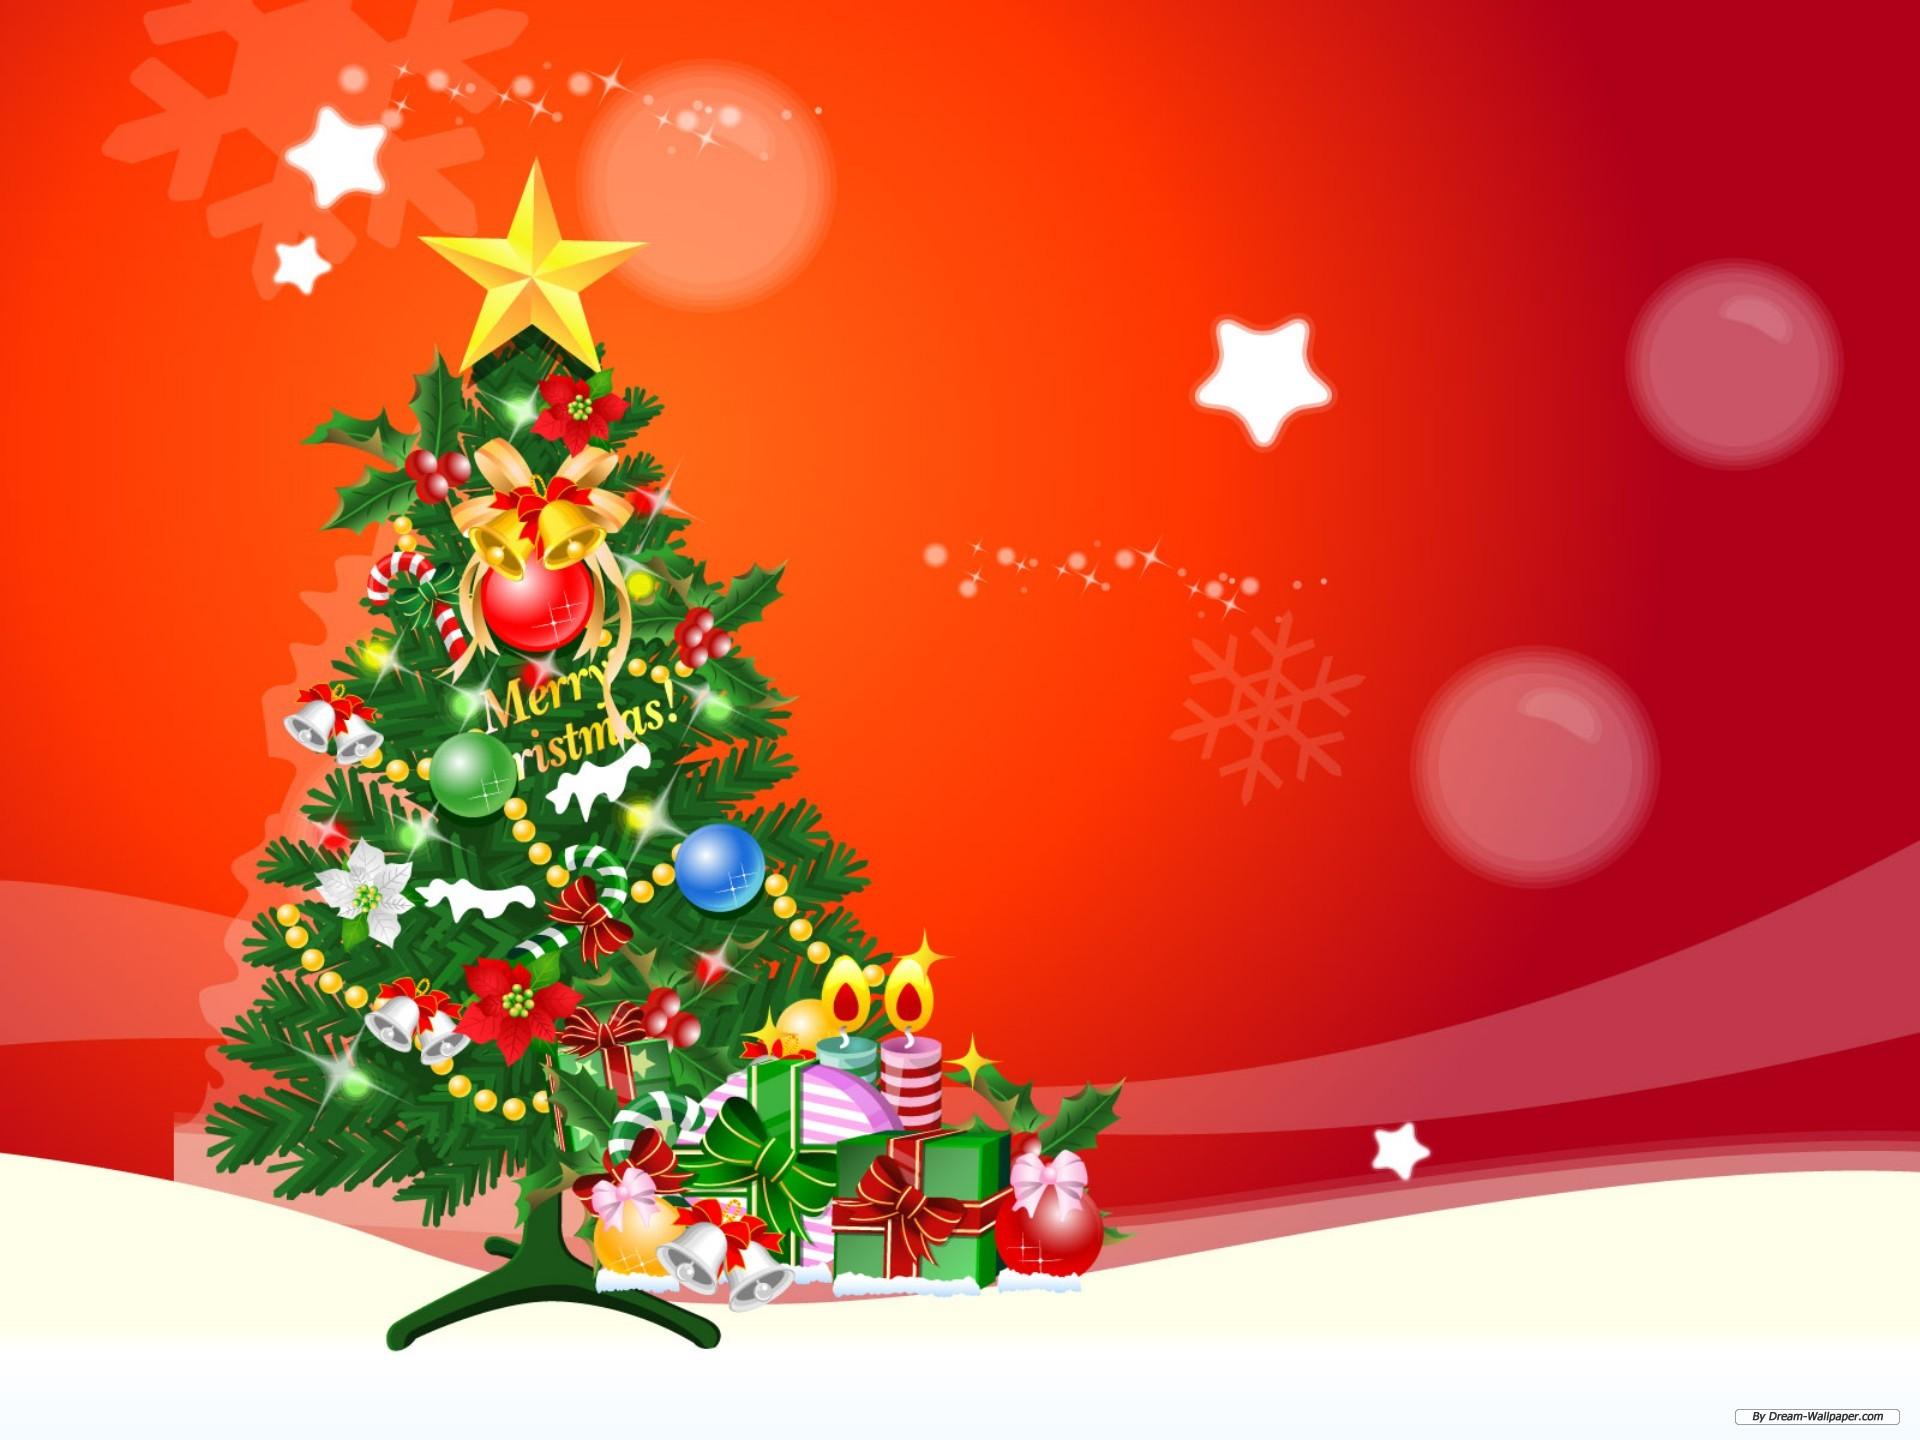 Holiday wallpaper   Christmas theme 4 wallpaper   1920x1440 wallpaper 1920x1440